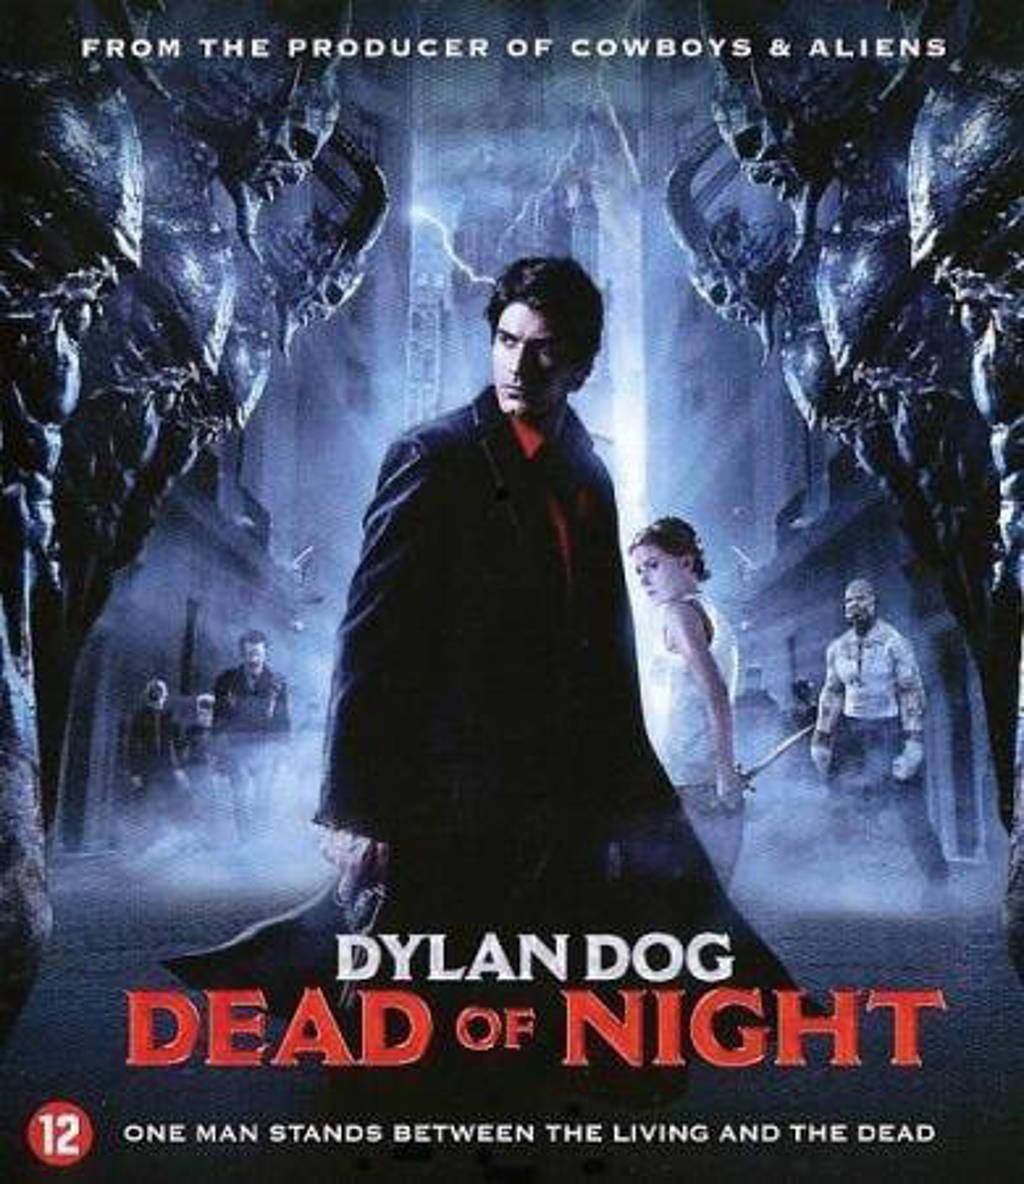 Dylan dog - Dead of night (Blu-ray)